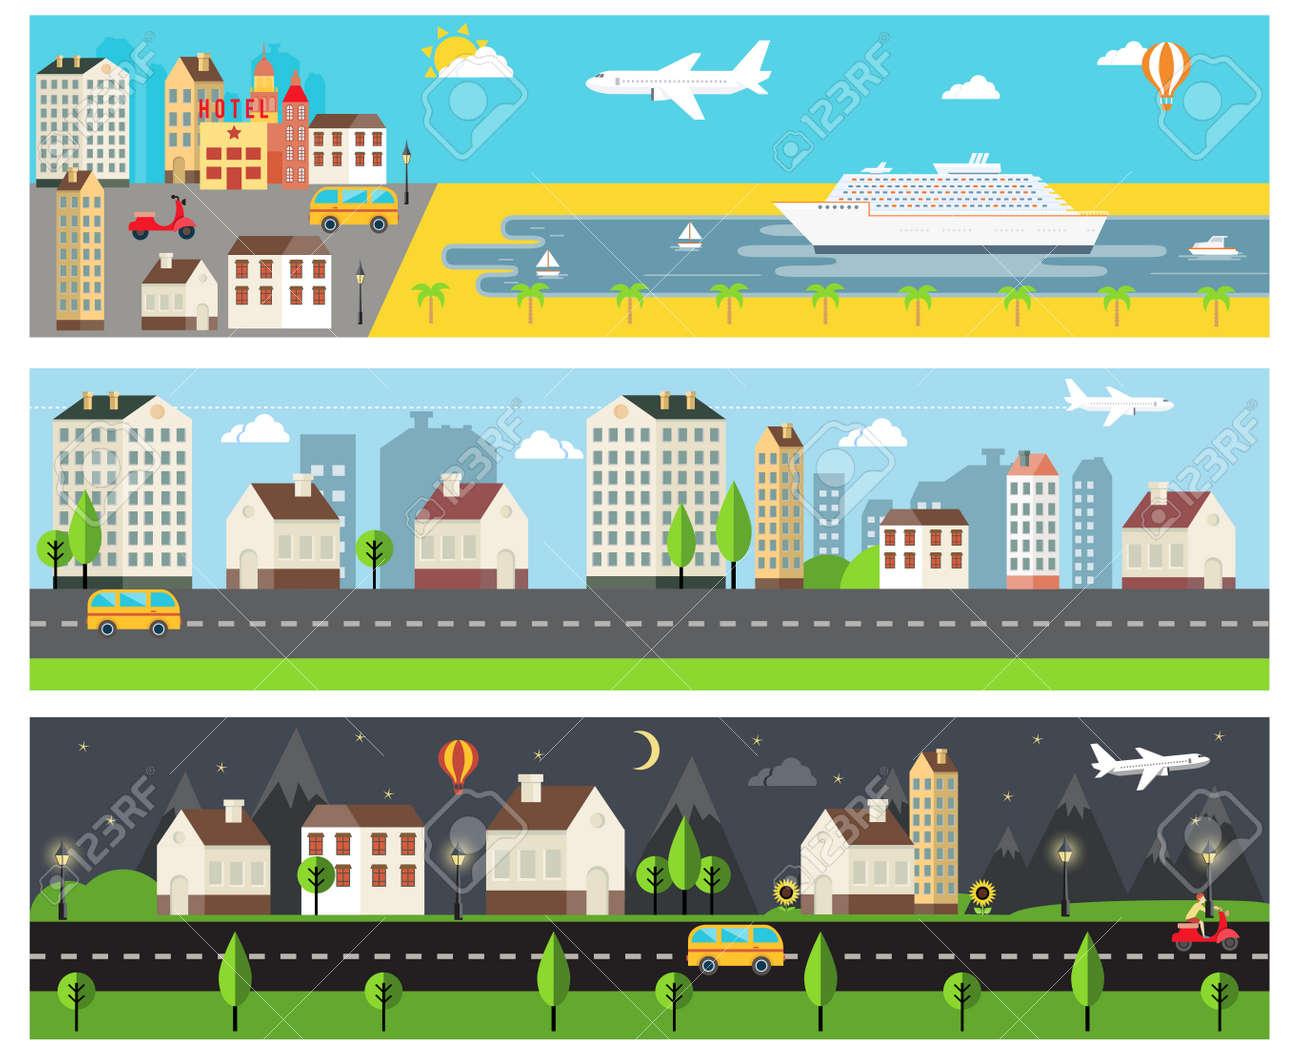 Cool Vector Cartooned Embankment Rural and Urban Road Banners - 166780598